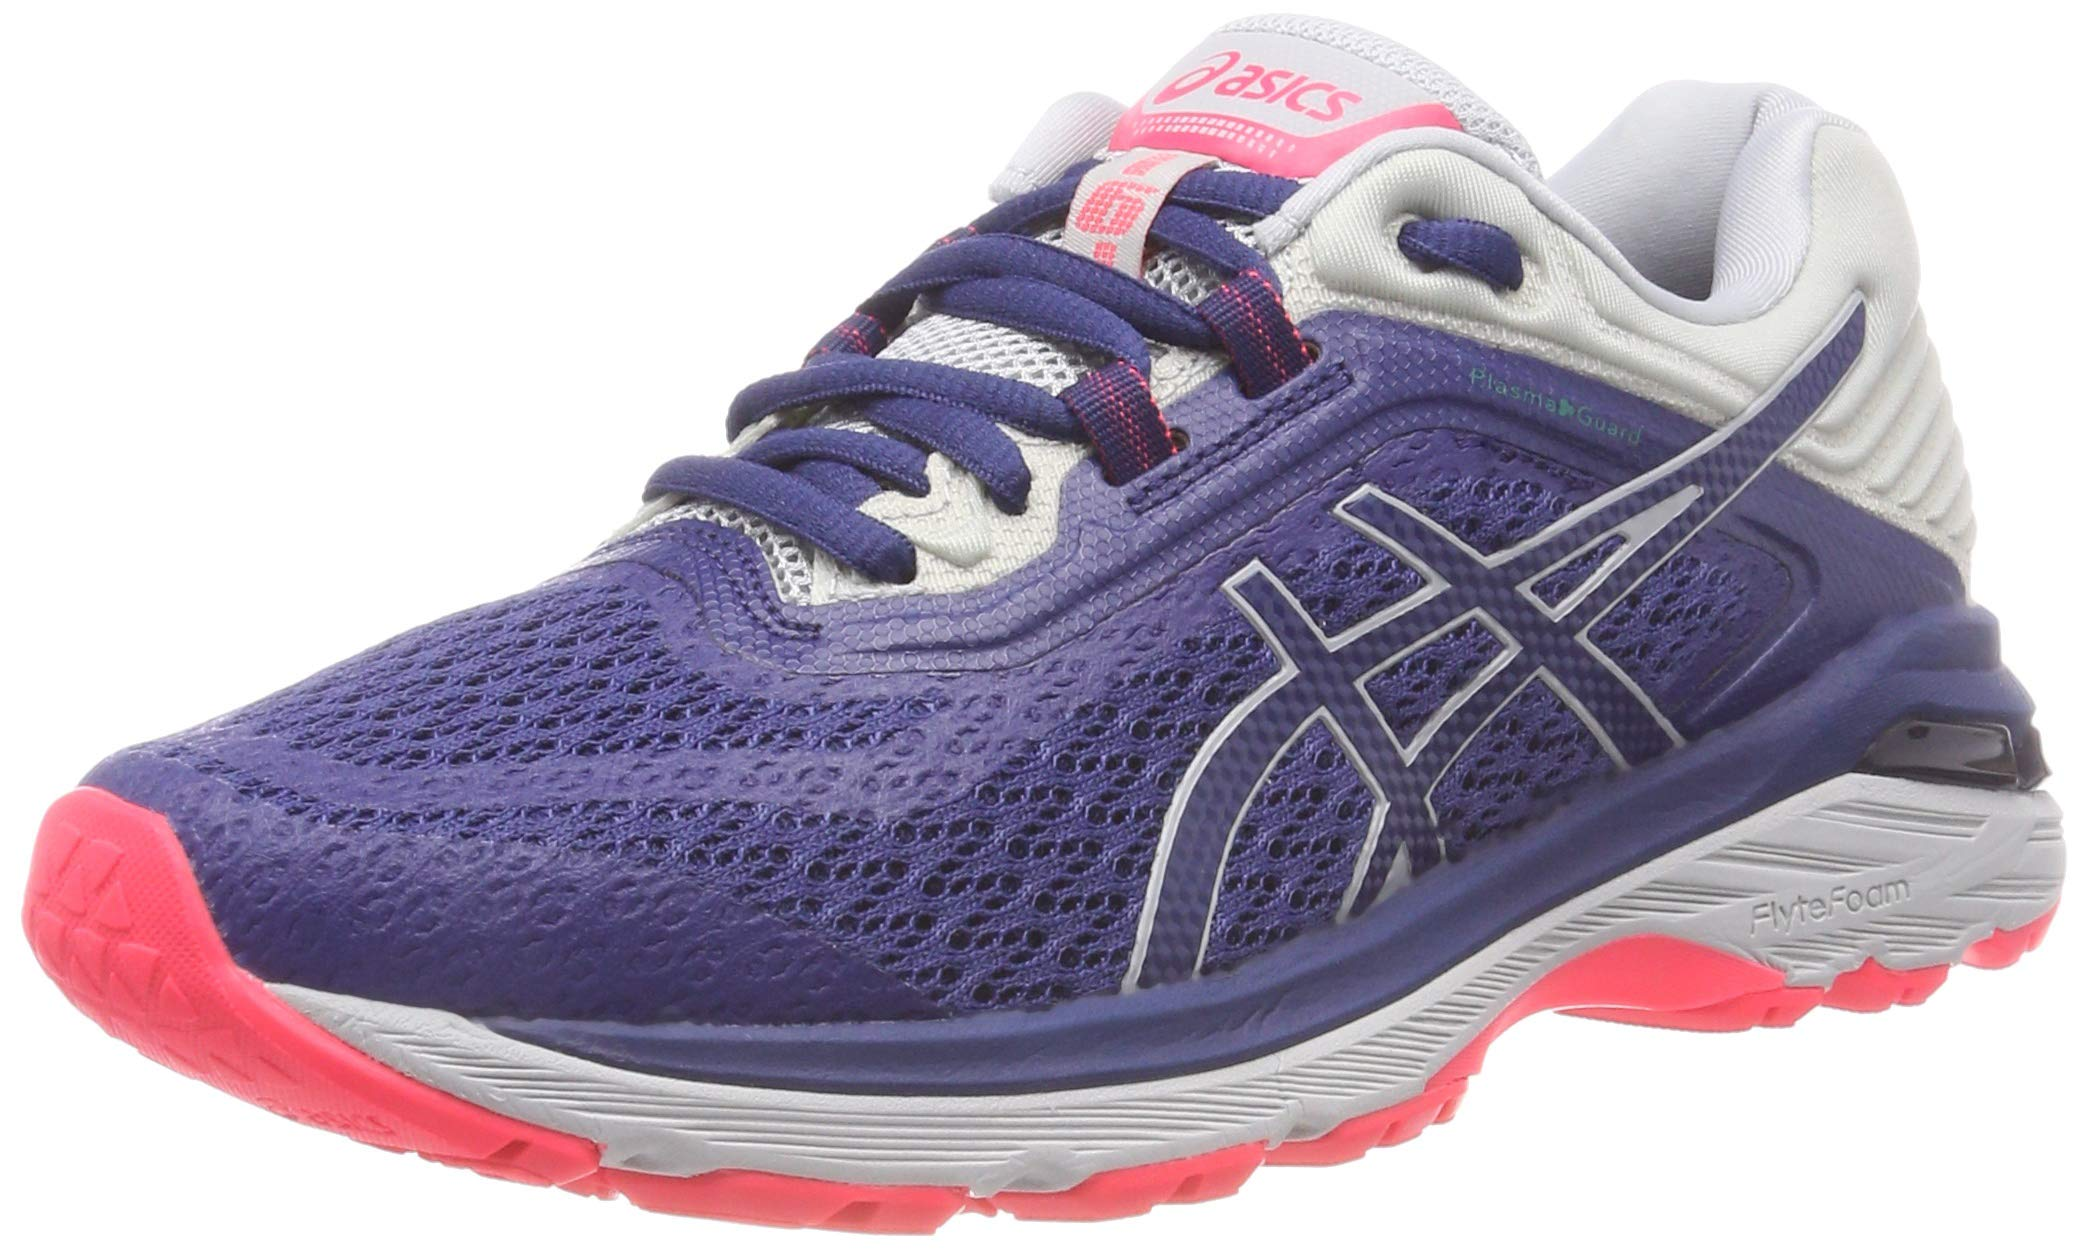 717kOCbUpIL - ASICS Women's Gt-2000 6 Trail Plasmaguard Running Shoes, 11.5 UK